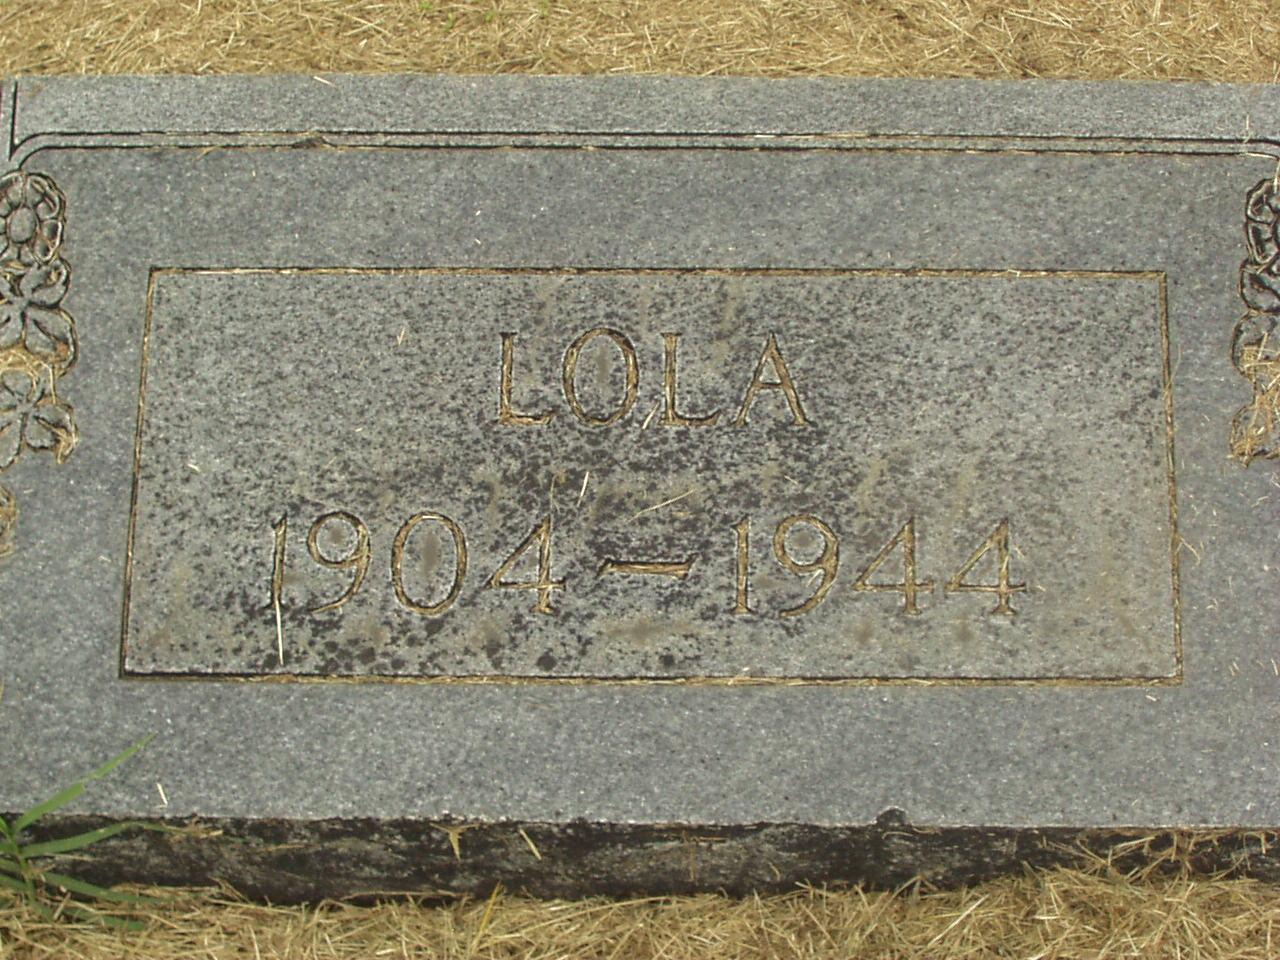 Lola Mae Matthews